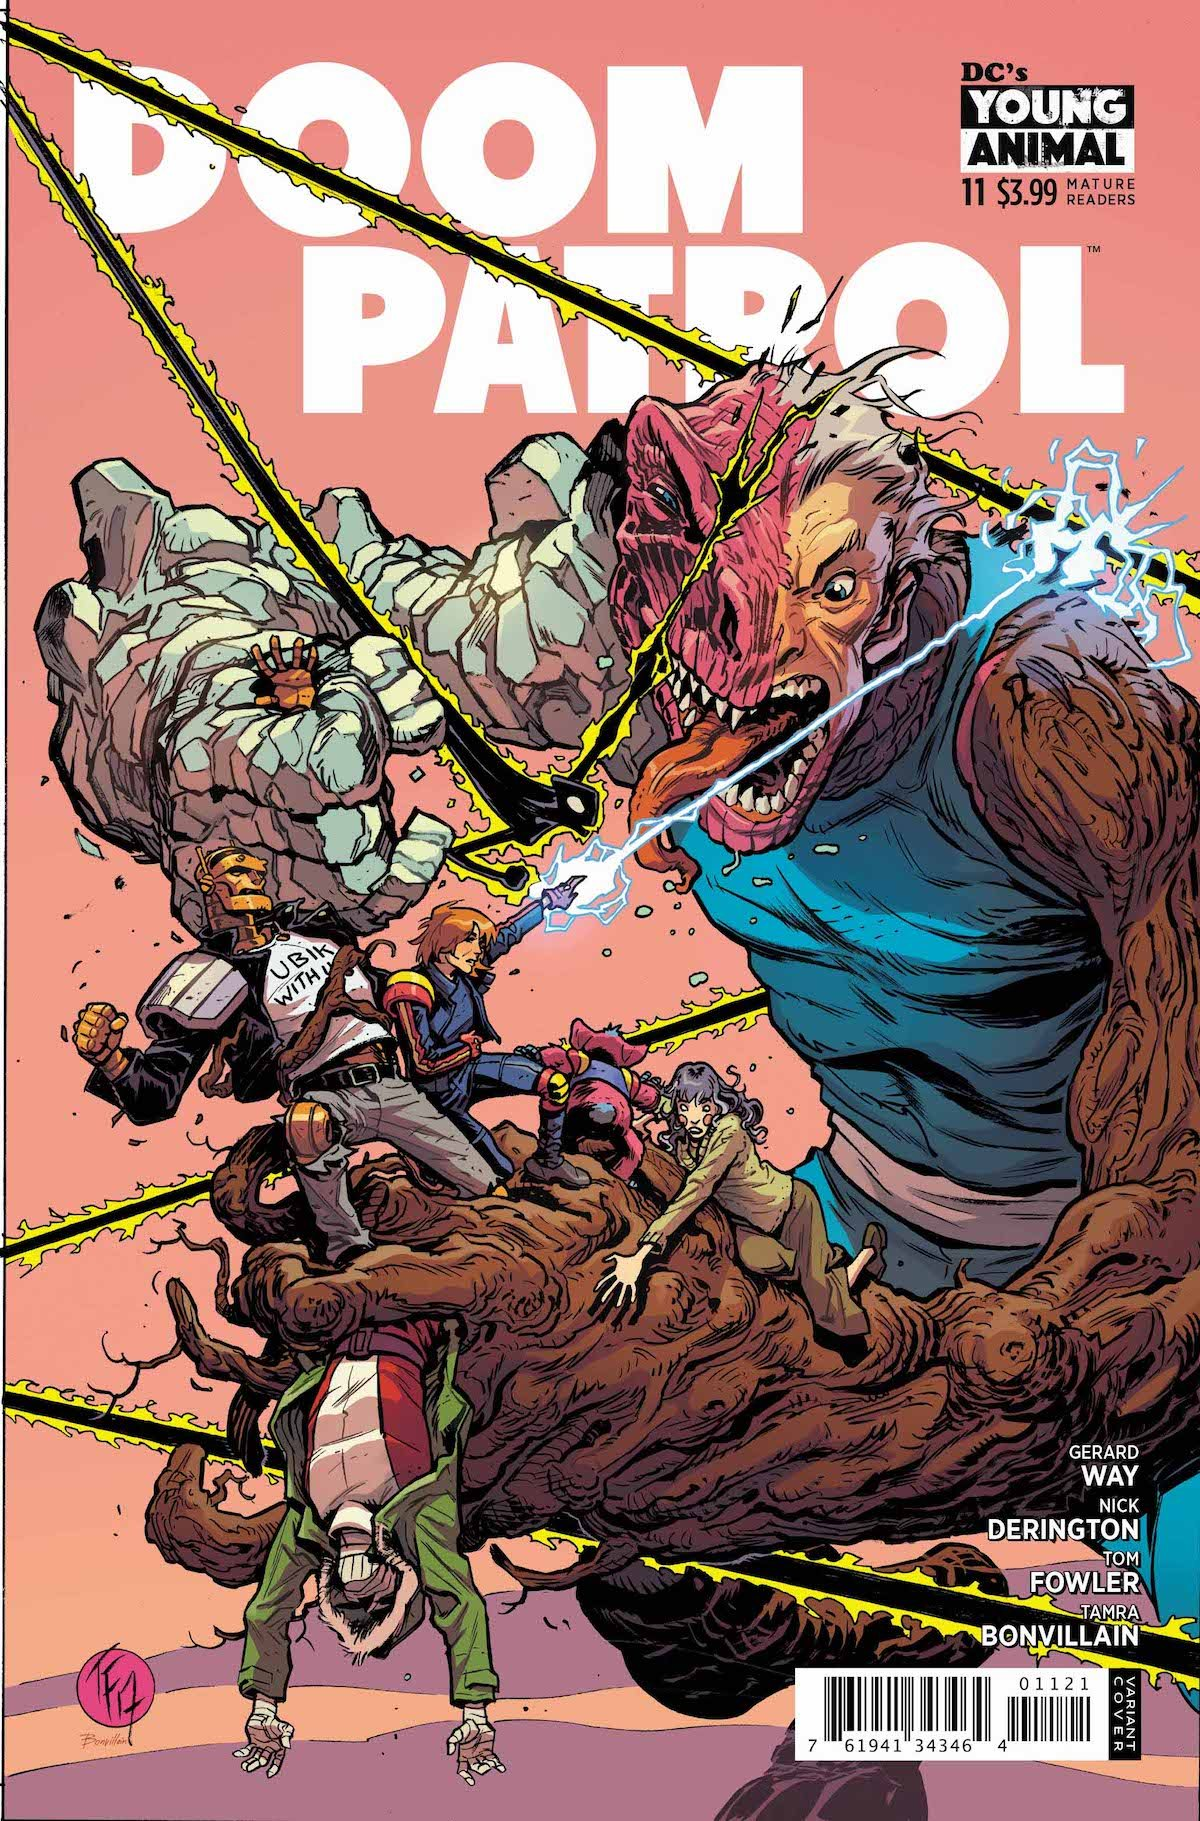 Doom Patrol #11 variant cover